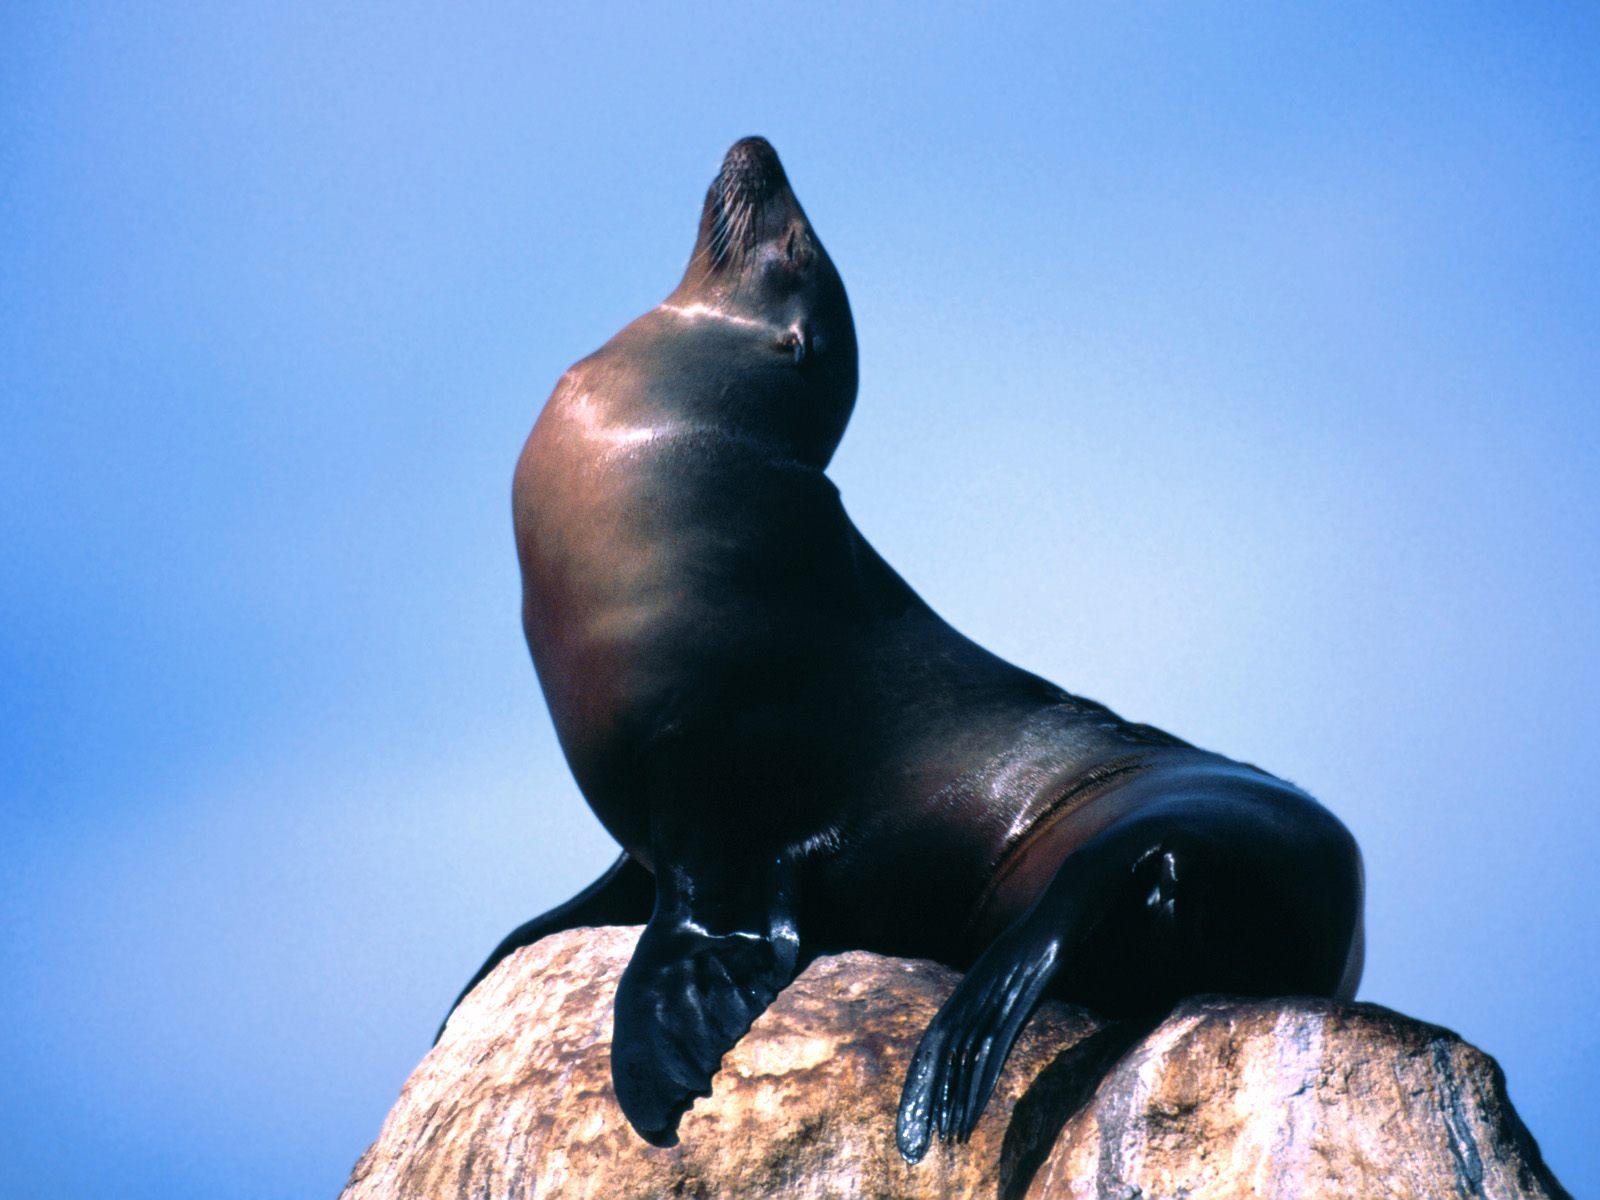 Sea Lion 9620 1600x1200 px